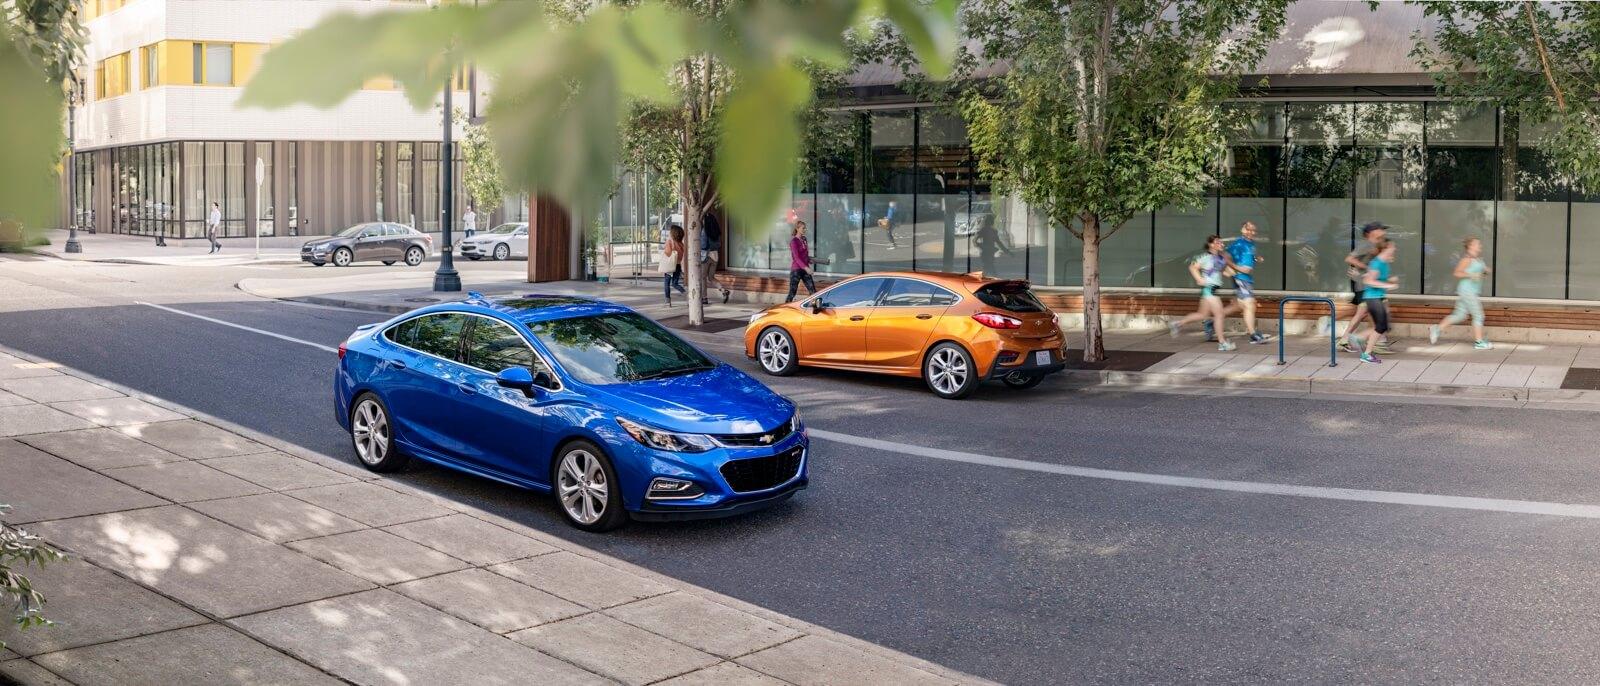 2017 Chevrolet Cruze Sedan blue exterior model parked